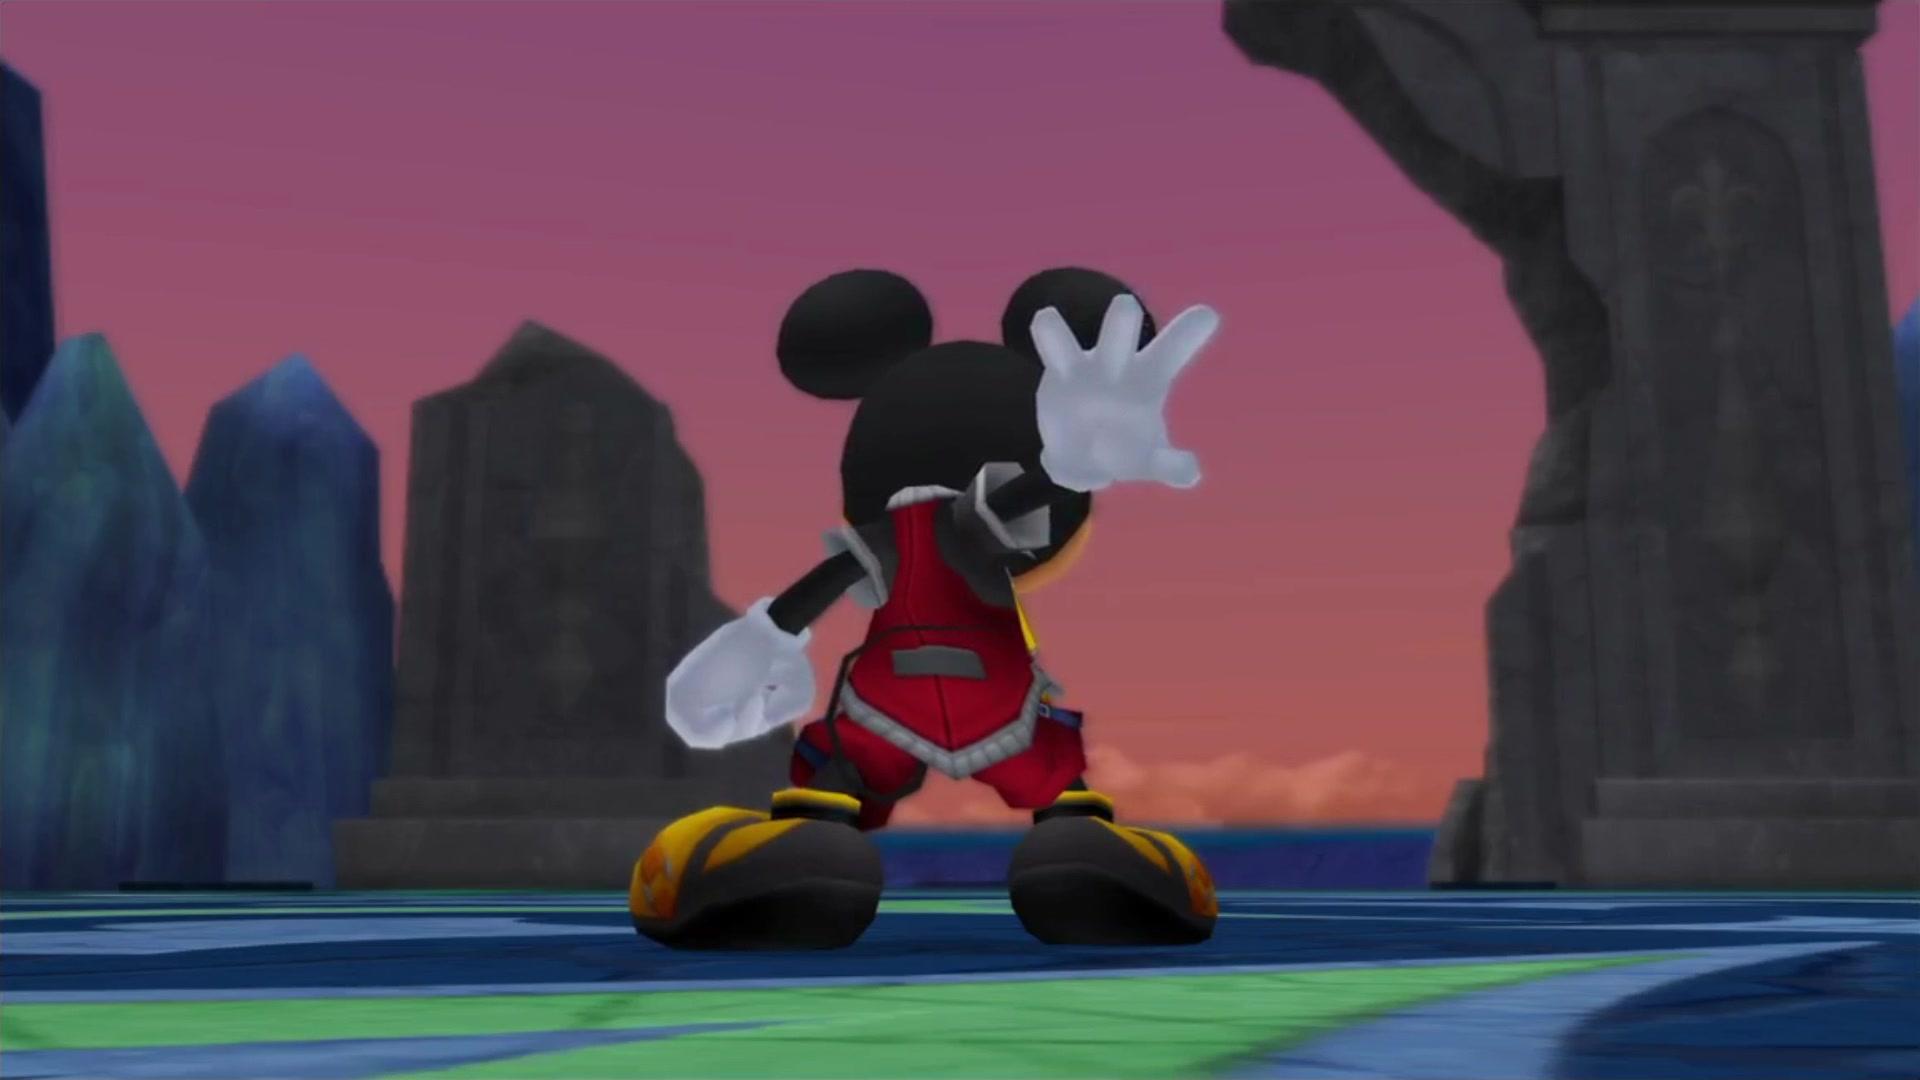 Kingdom Hearts 2 HD 1.5 + 2.5 ReMIX Goofy Dies/Mickey's Revenge 1